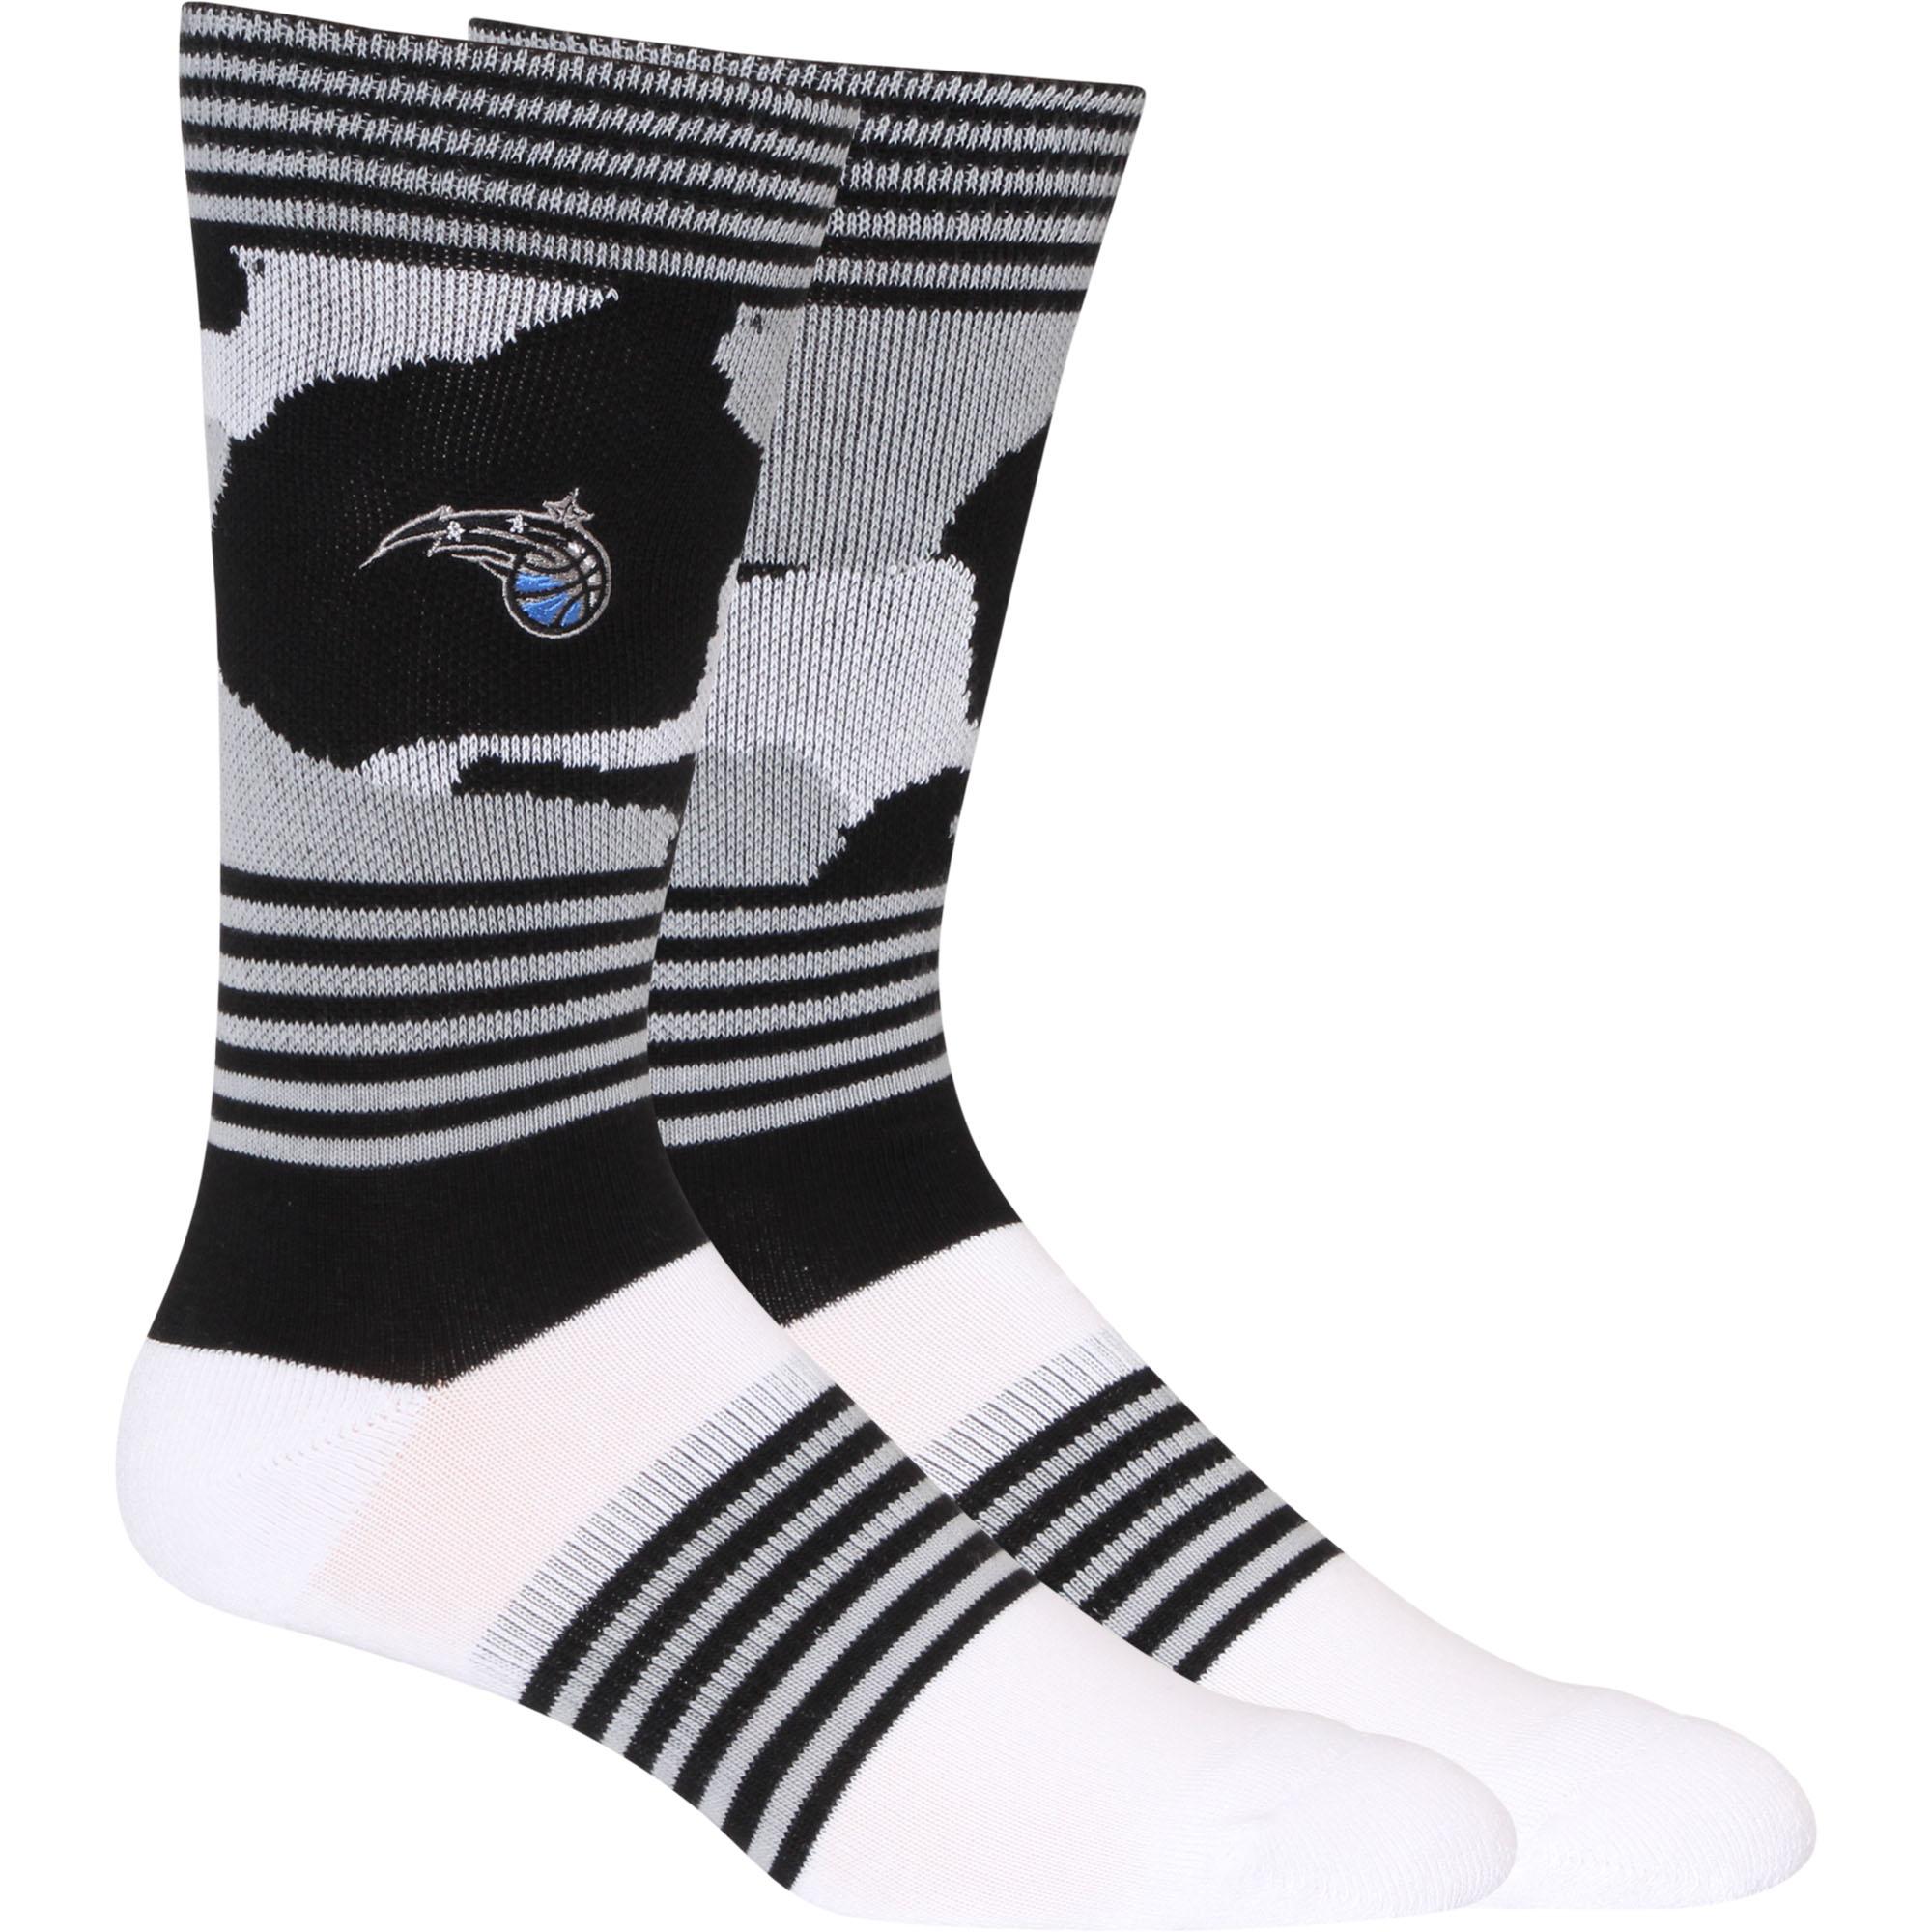 Orlando Magic Camo Crew Socks - L